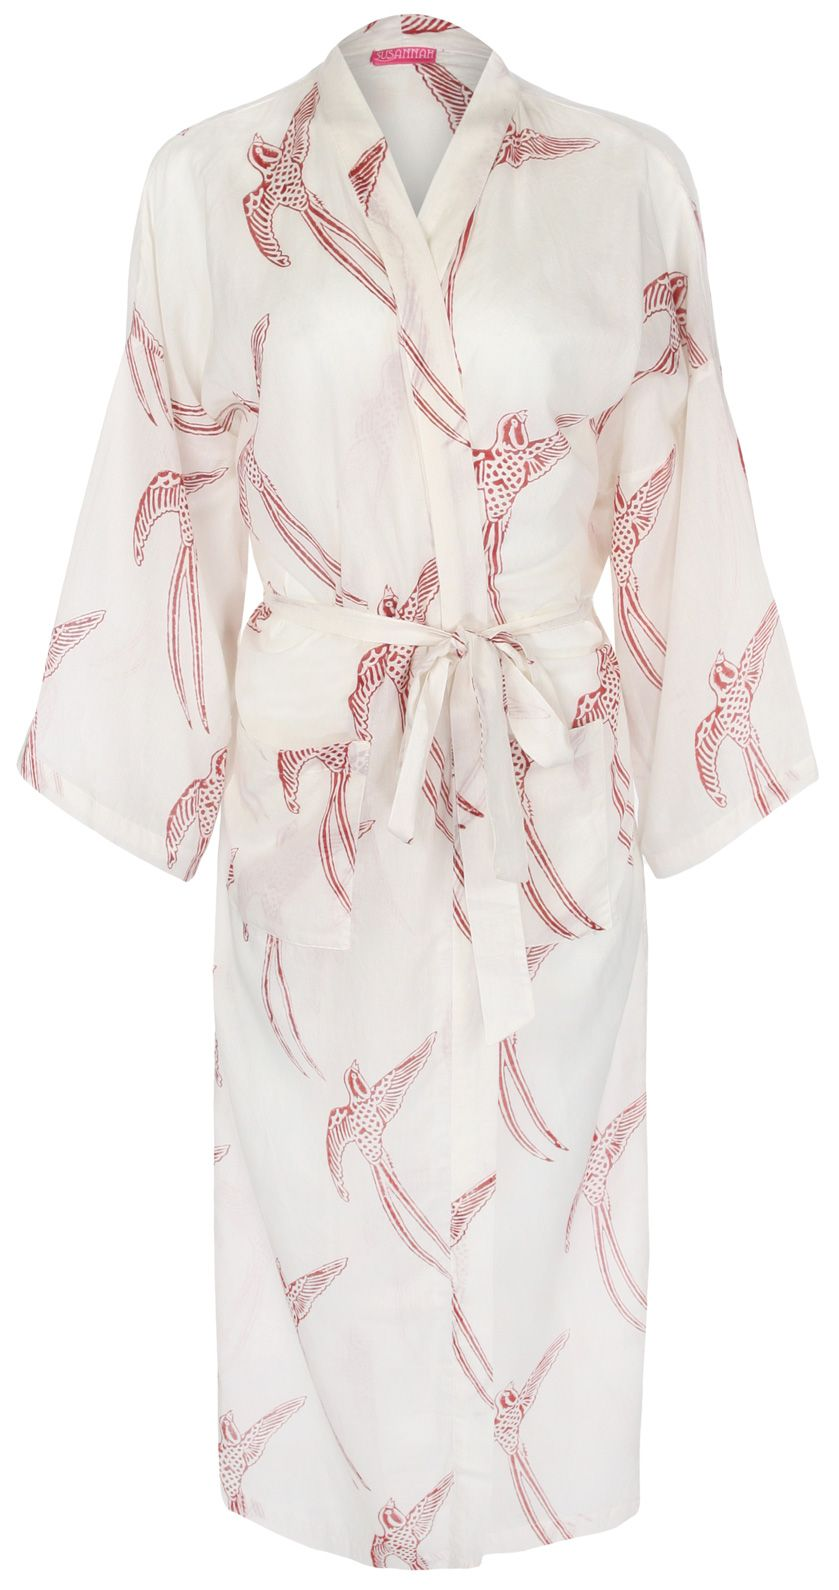 Pin by Susannah Cotton Kimono Robes on Susannah Cotton Light Cotton ... 60c1469ee